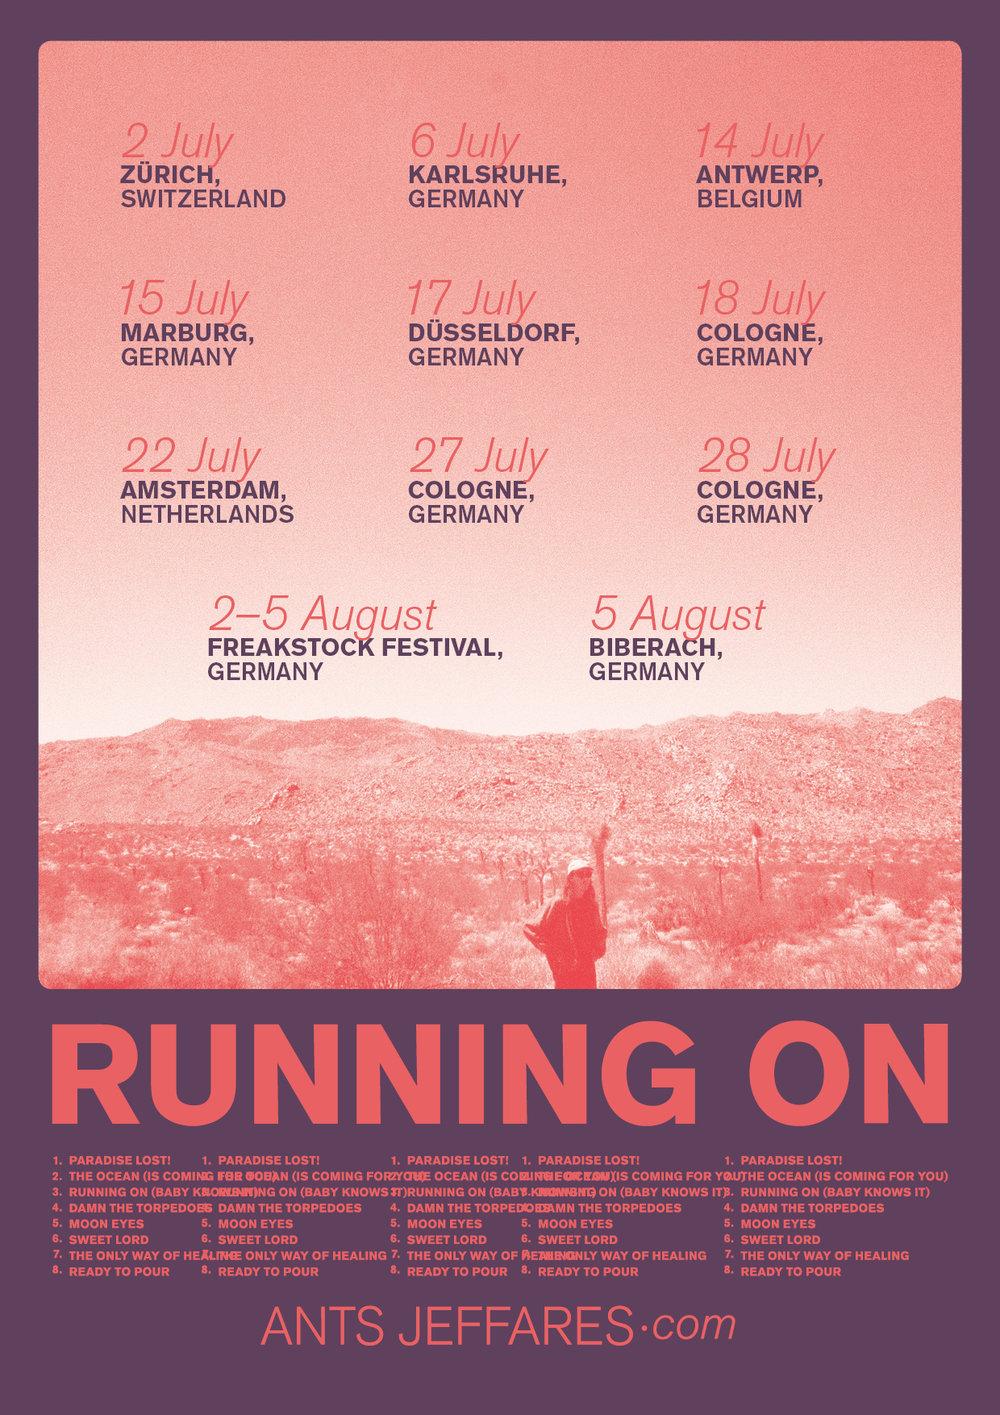 Ants Jeffares Running On Tour Poster.jpg